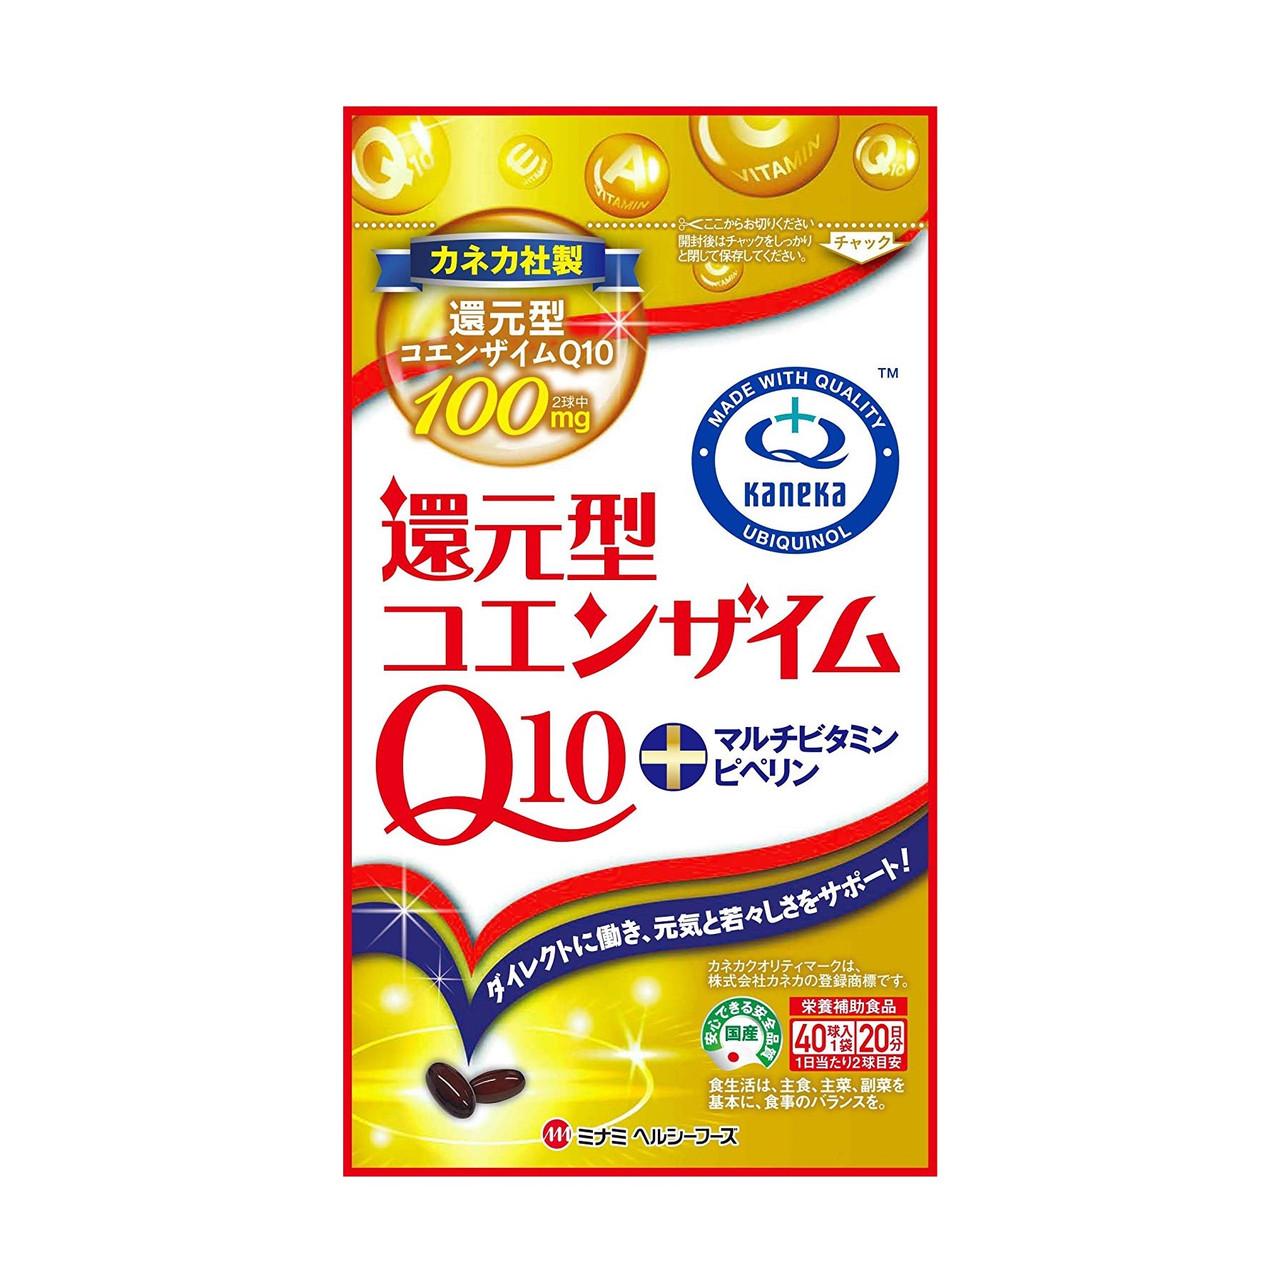 БАД Minami Coenzyme Q10 Multivitamins Коэнзим Q10 с мультивитаминами